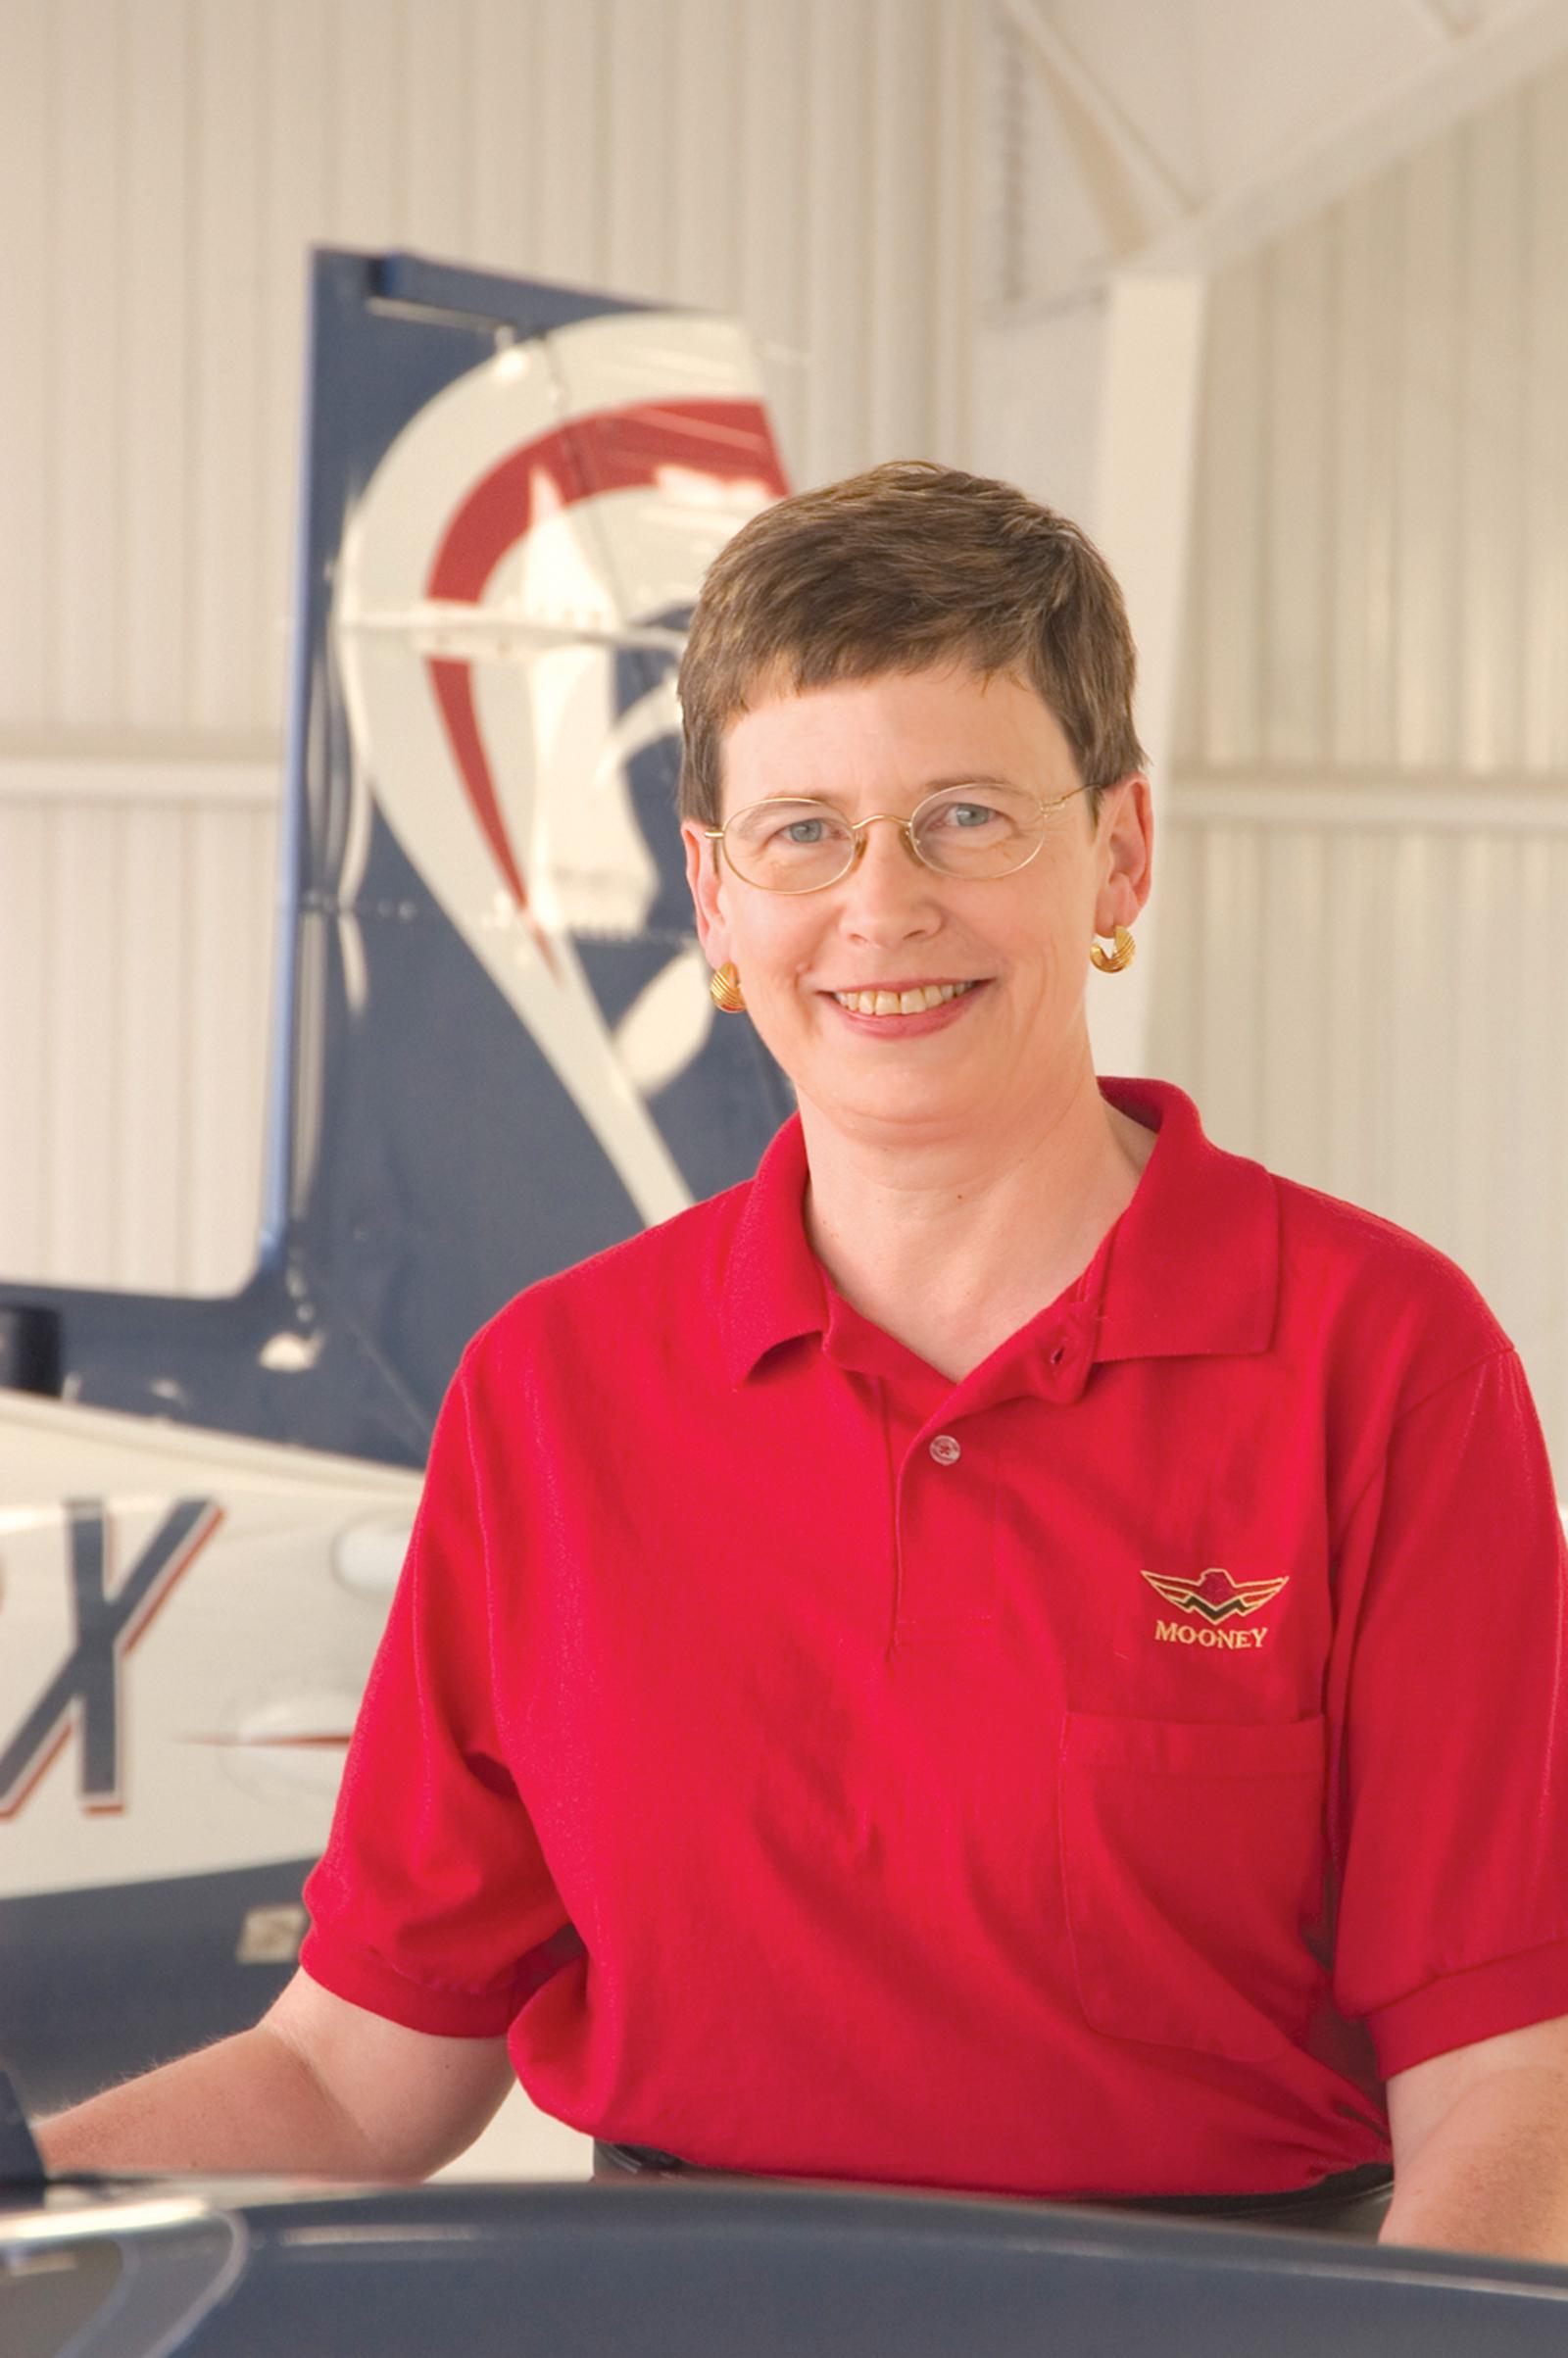 Mooney CEO Gretchen Jahn: A Welcome Novelty in Aviation